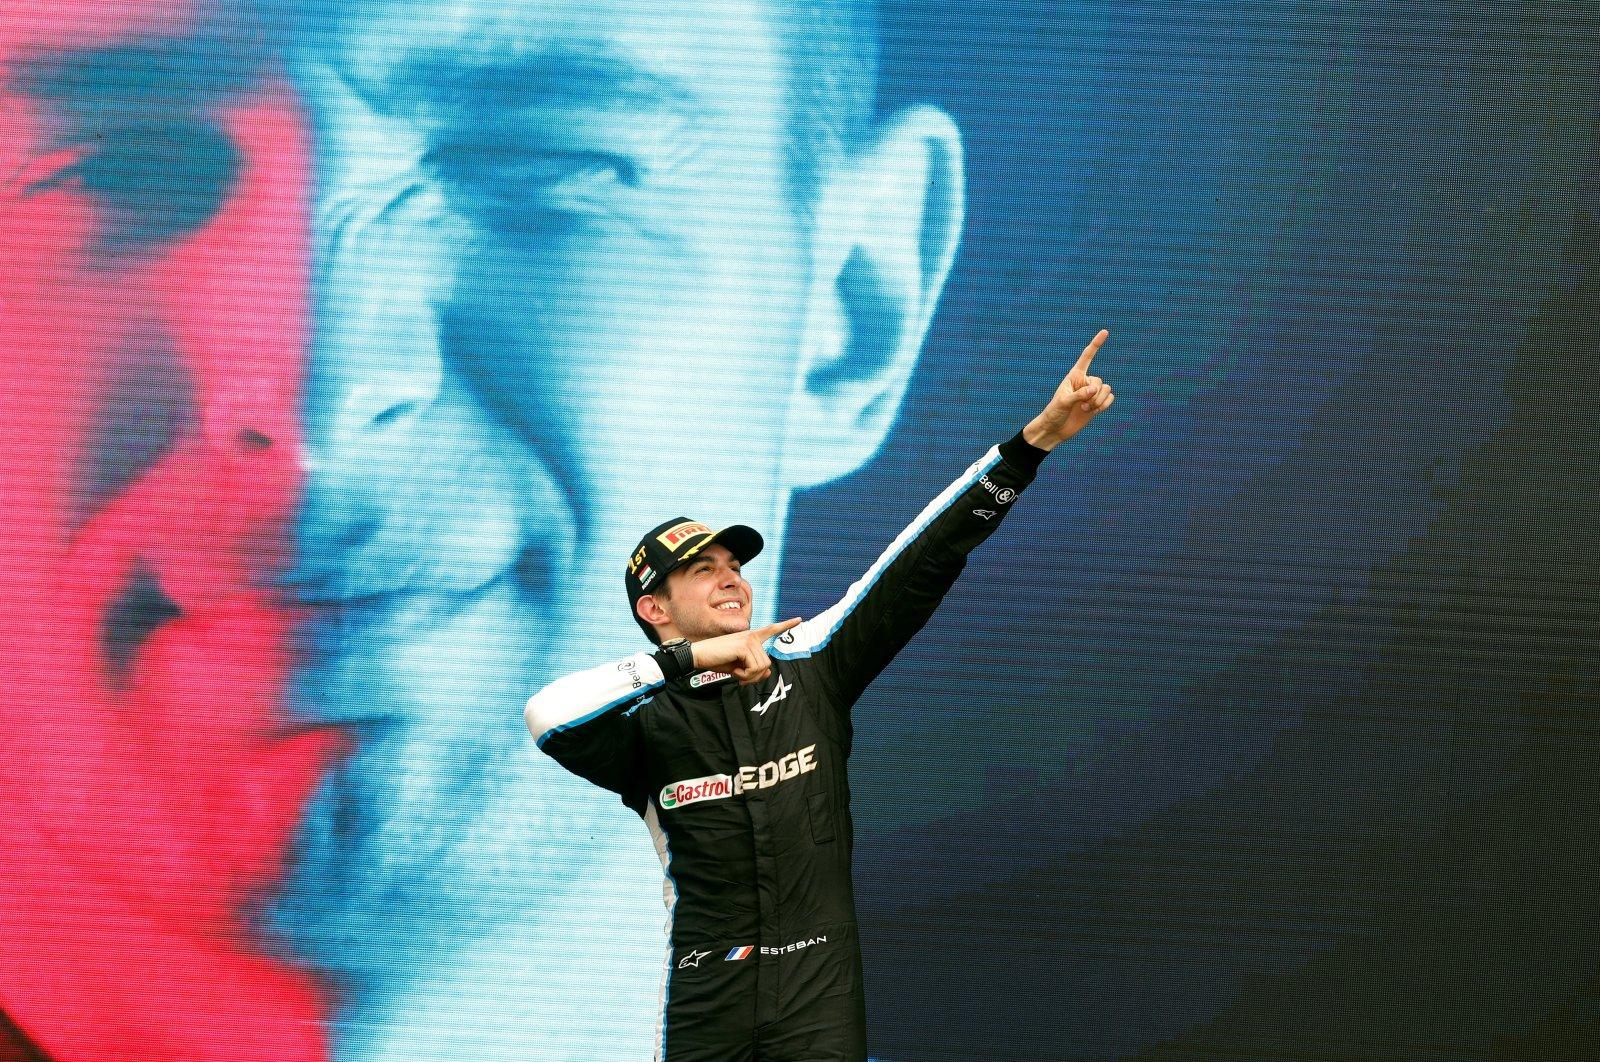 Alpine's Esteban Ocon celebrates on the podium after winning the race, Aug. 1, 2021. (Reuters Photo)